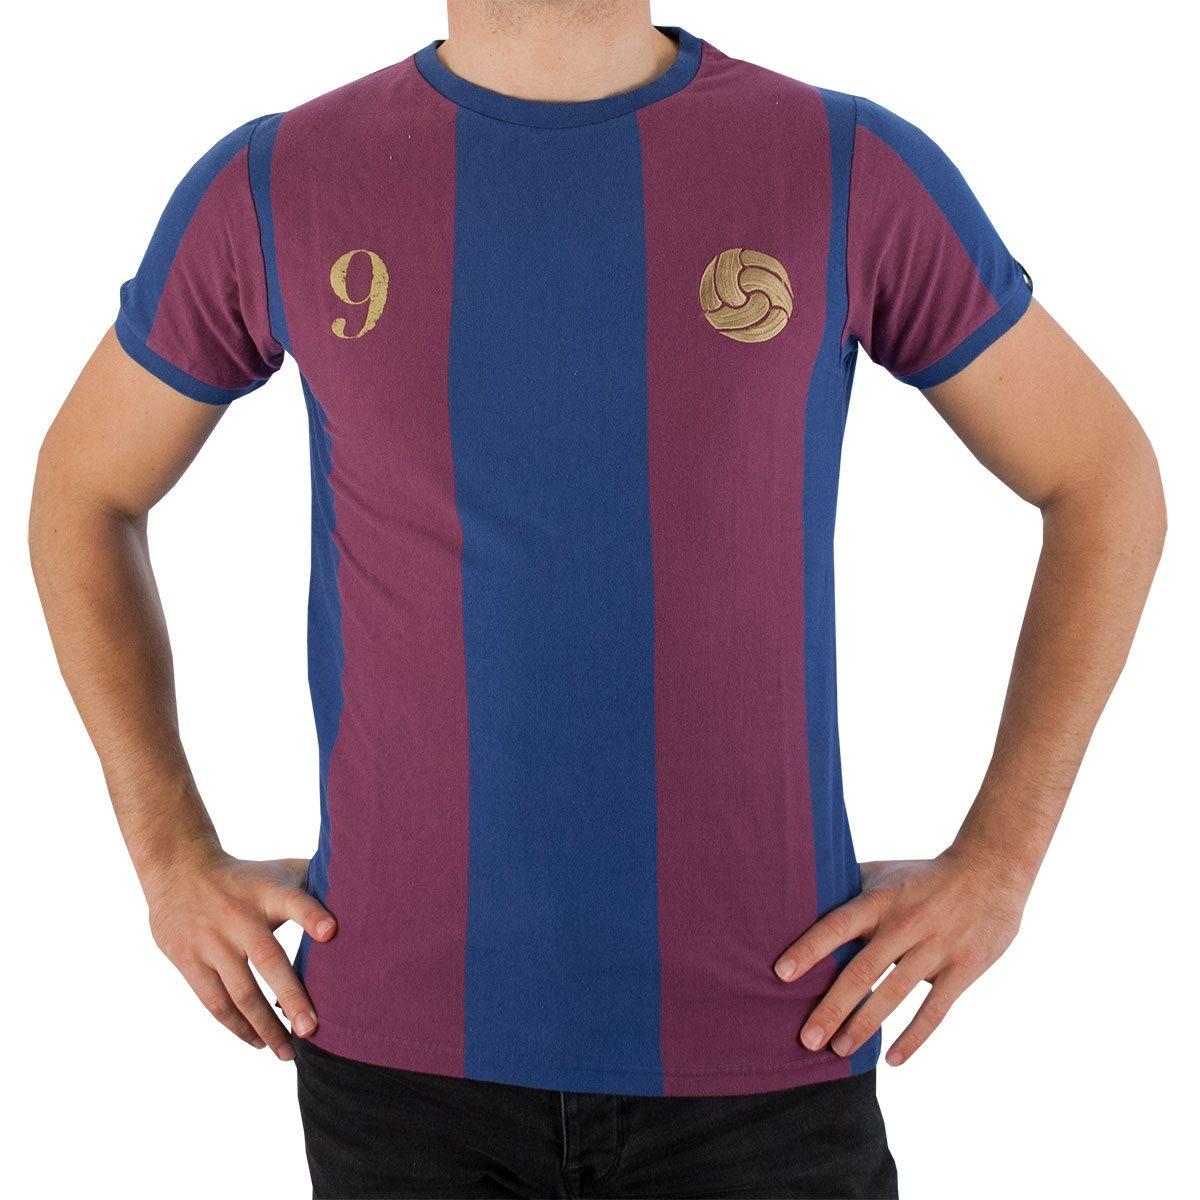 2e0219f5086 Fc Barcelona Vintage Jersey – Verein Bild Idee